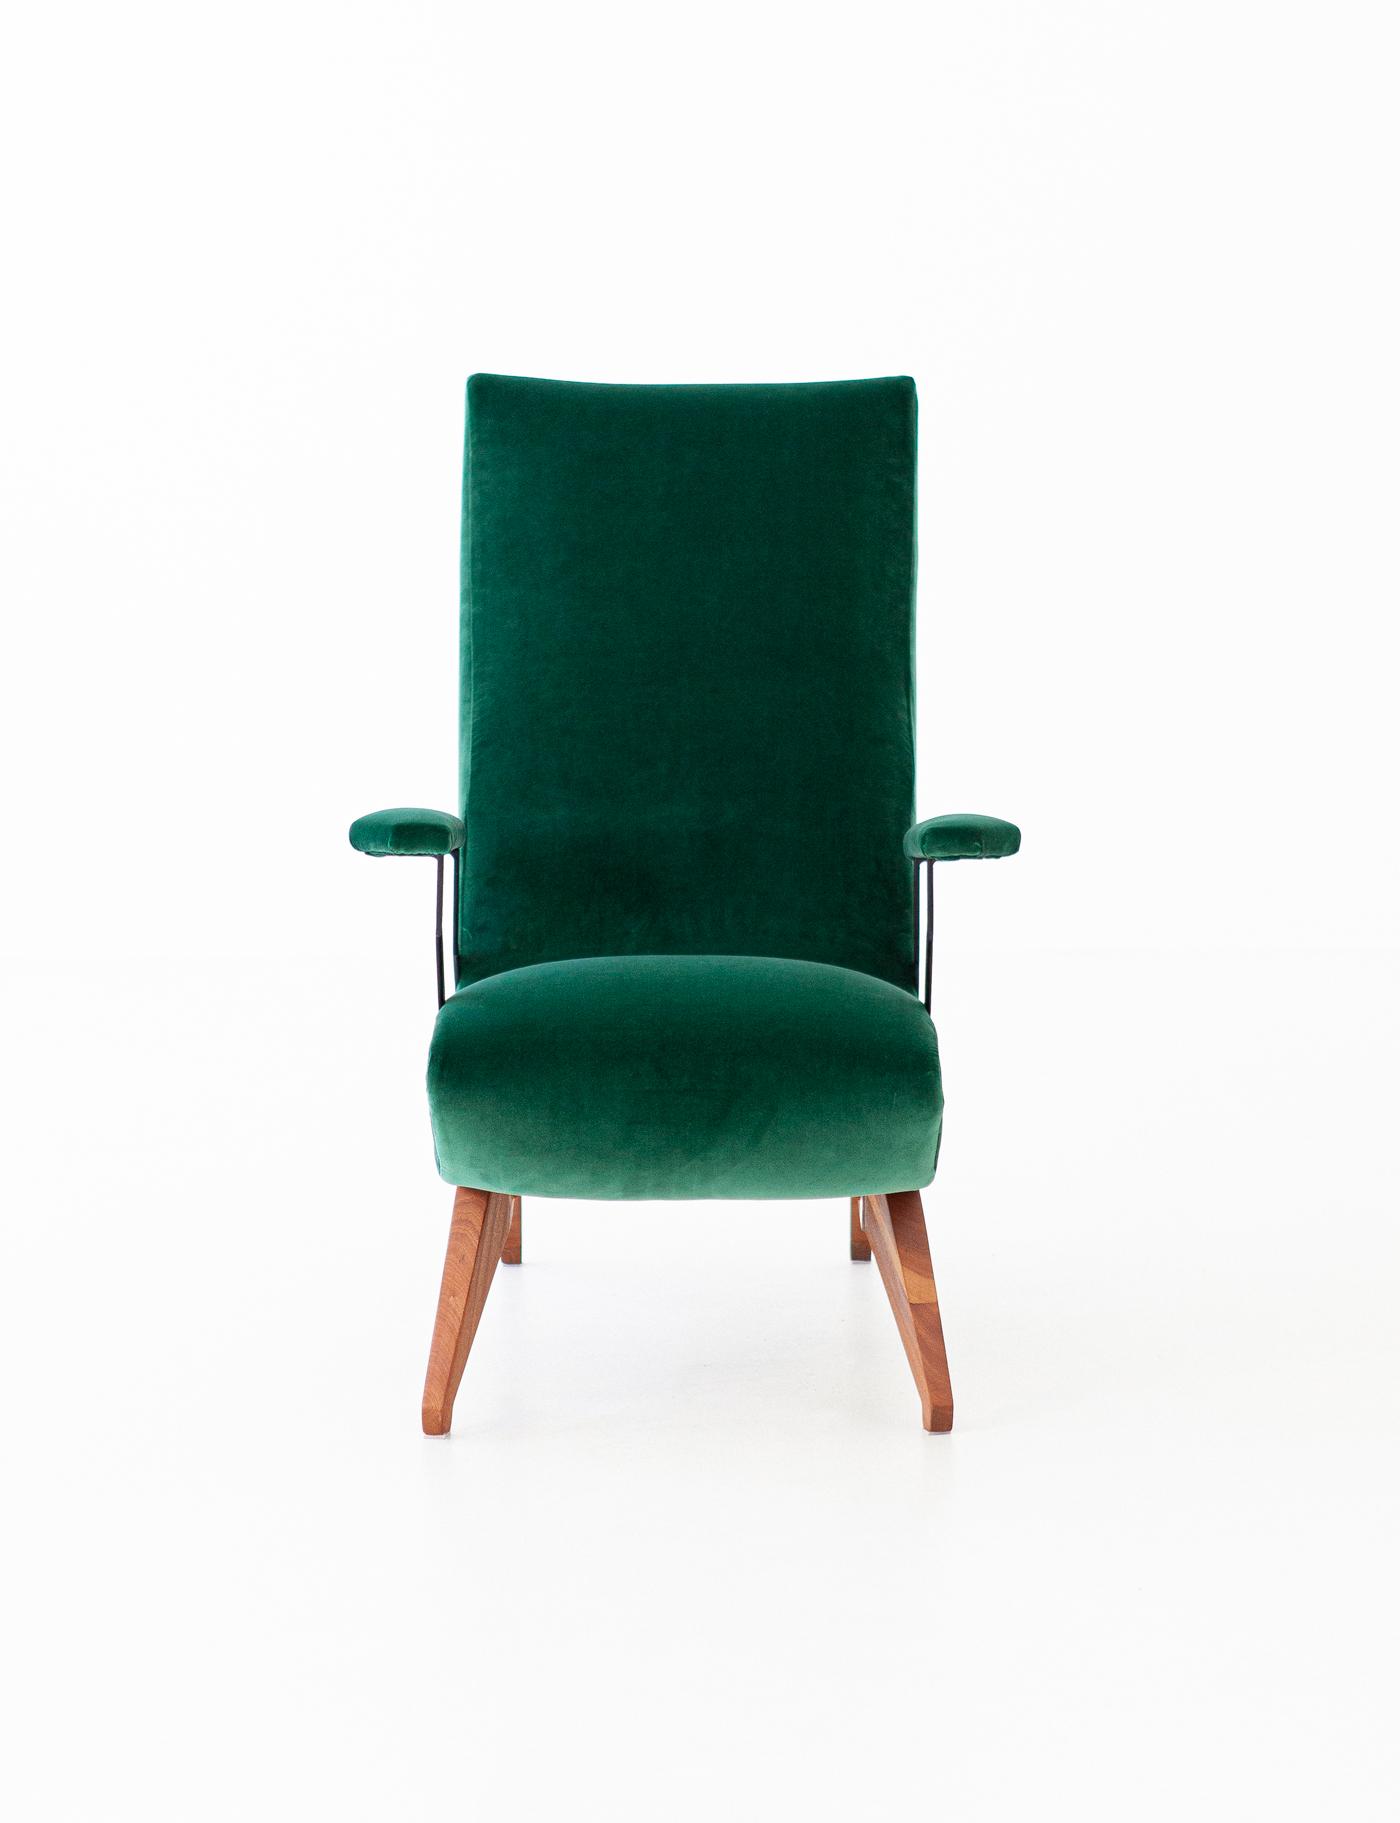 1950s-green-velvet-mahogany-italian-armchair-4-se290